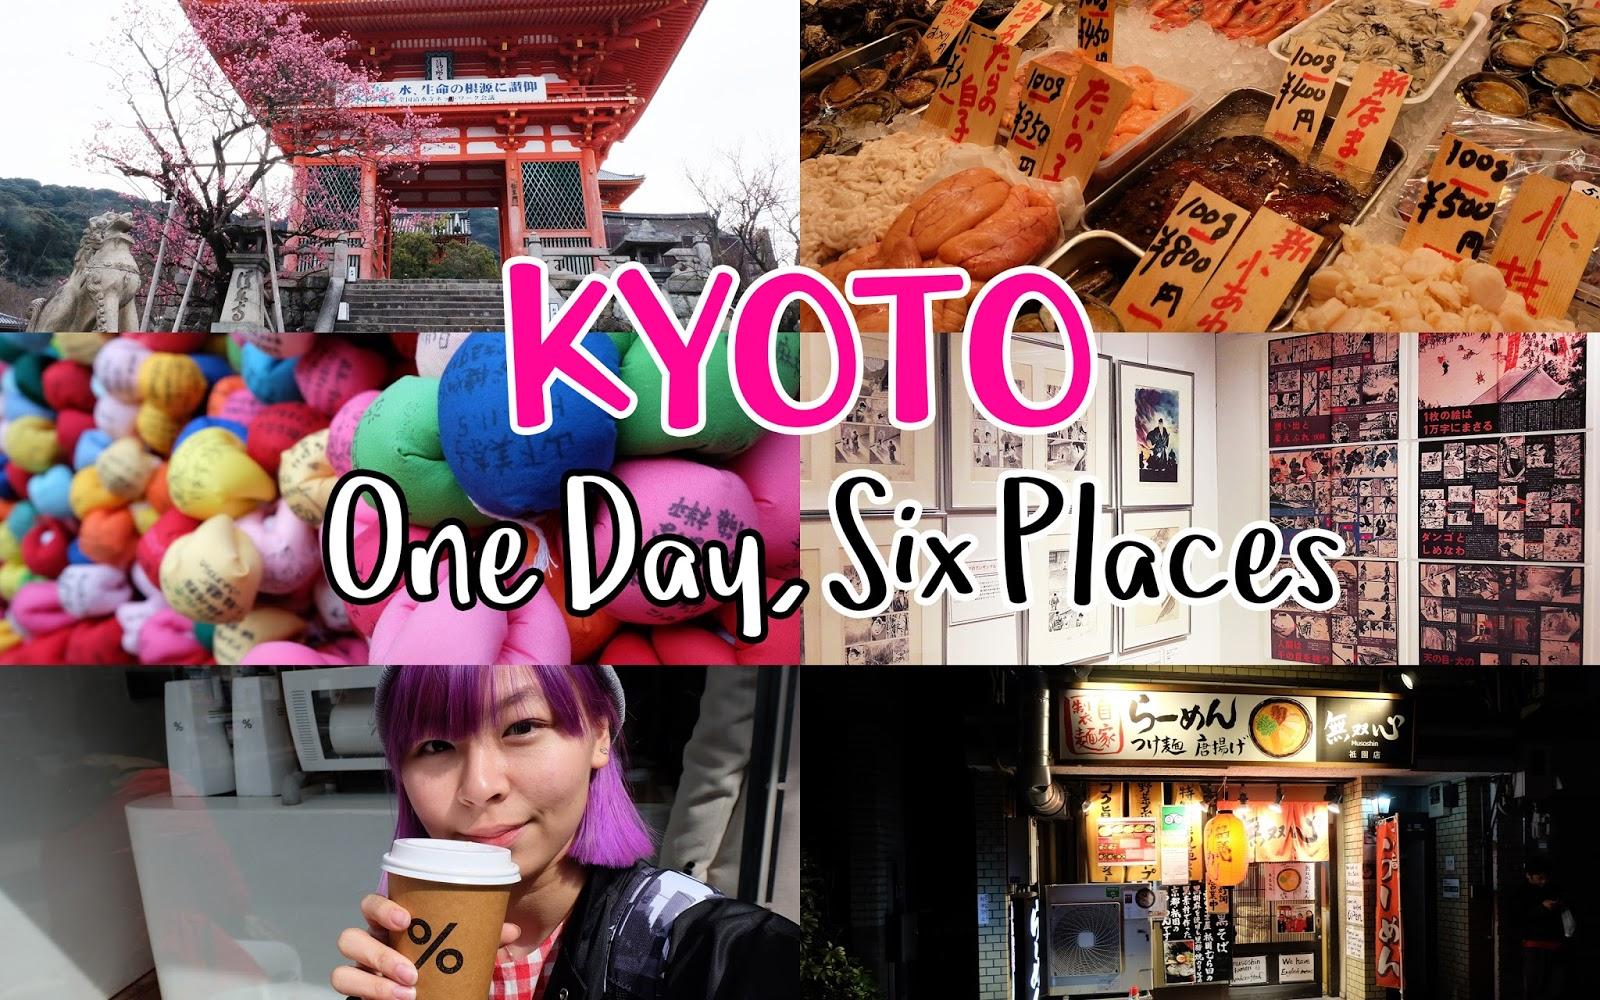 One Day 6 places Kyoto Blog | www.bigdreamerblog.com